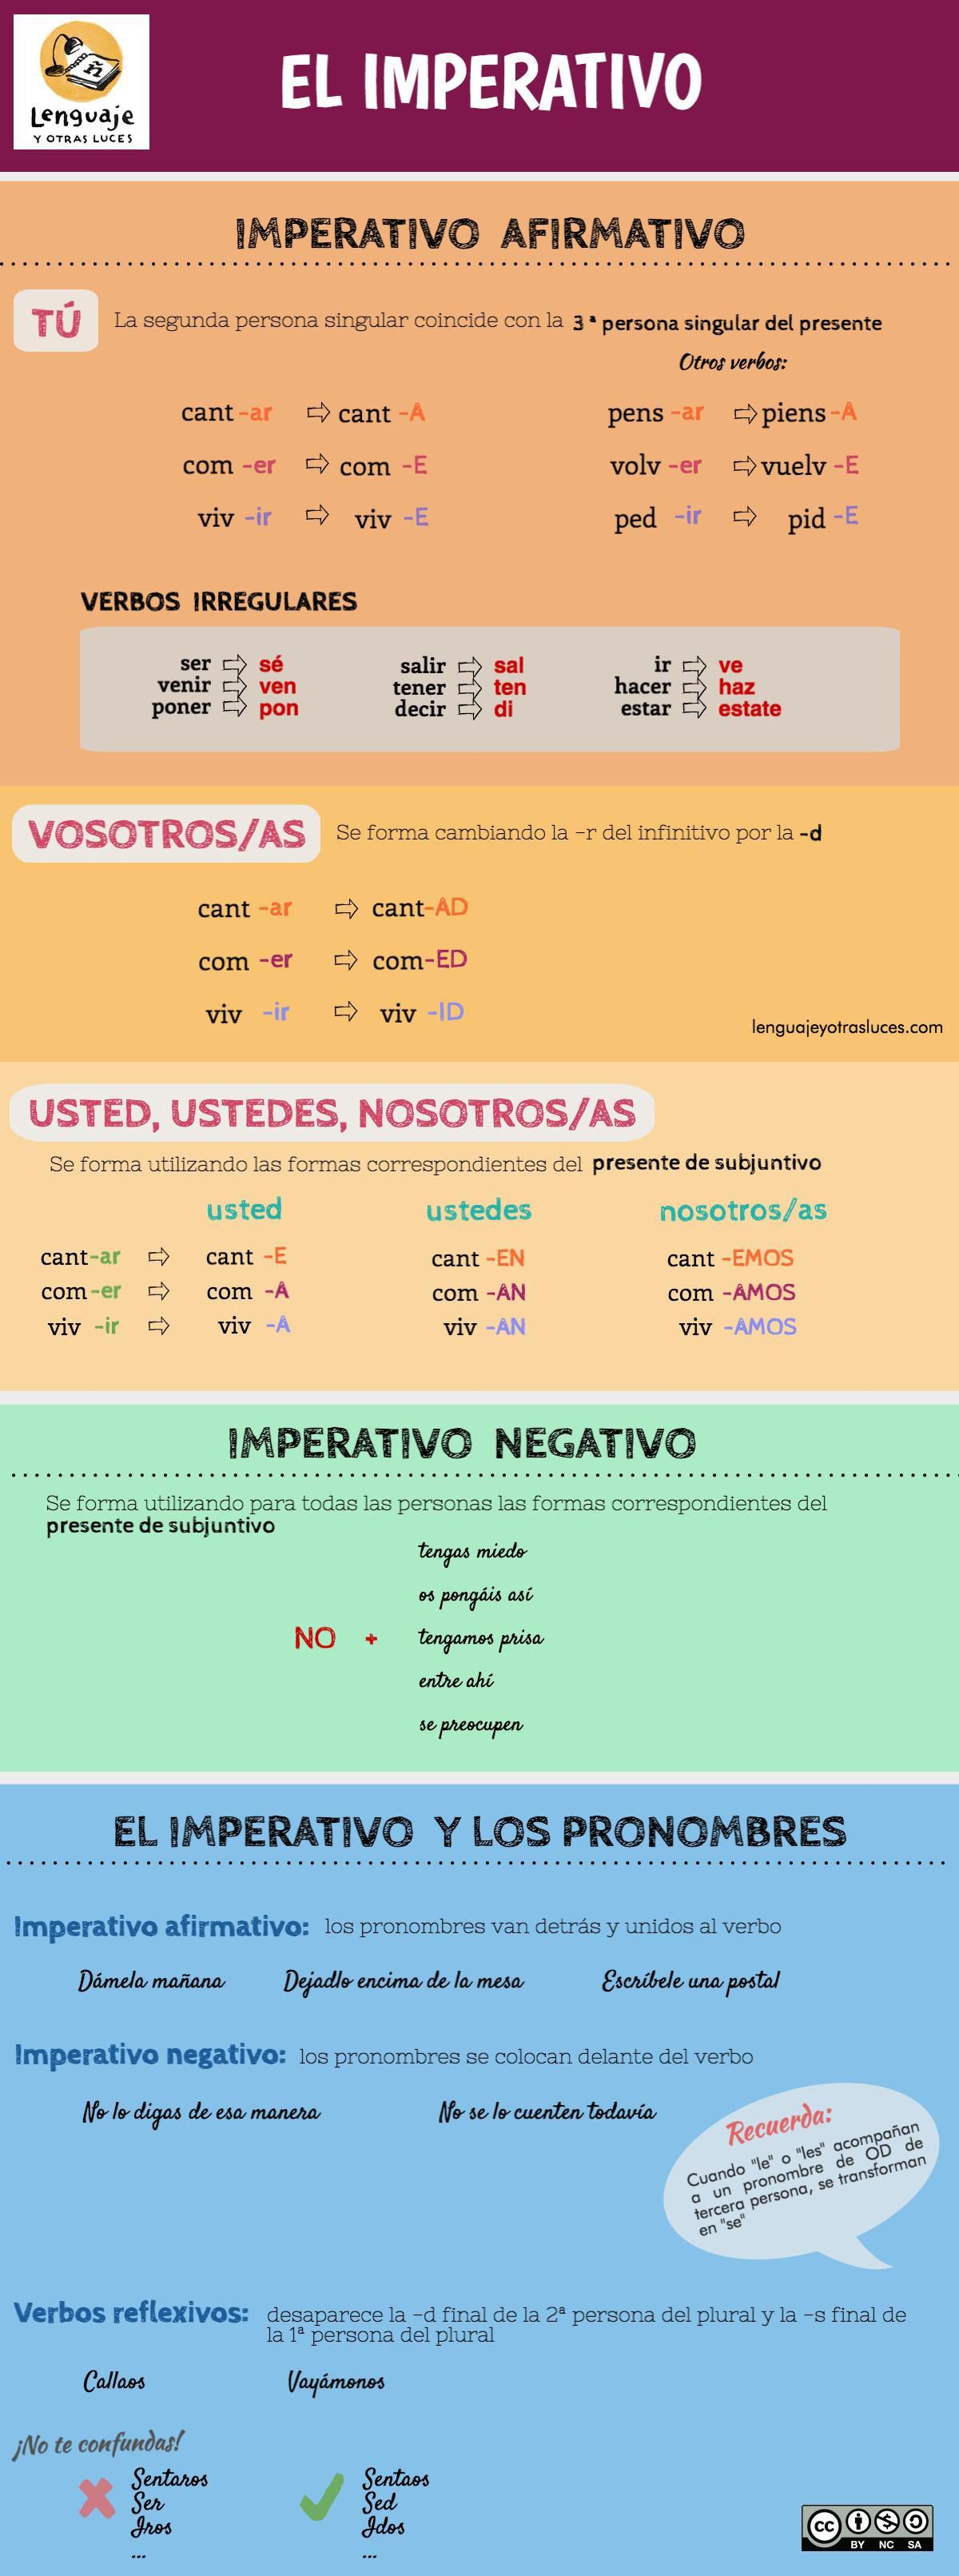 El Imperativo En Español Imperativo En Español Aprender